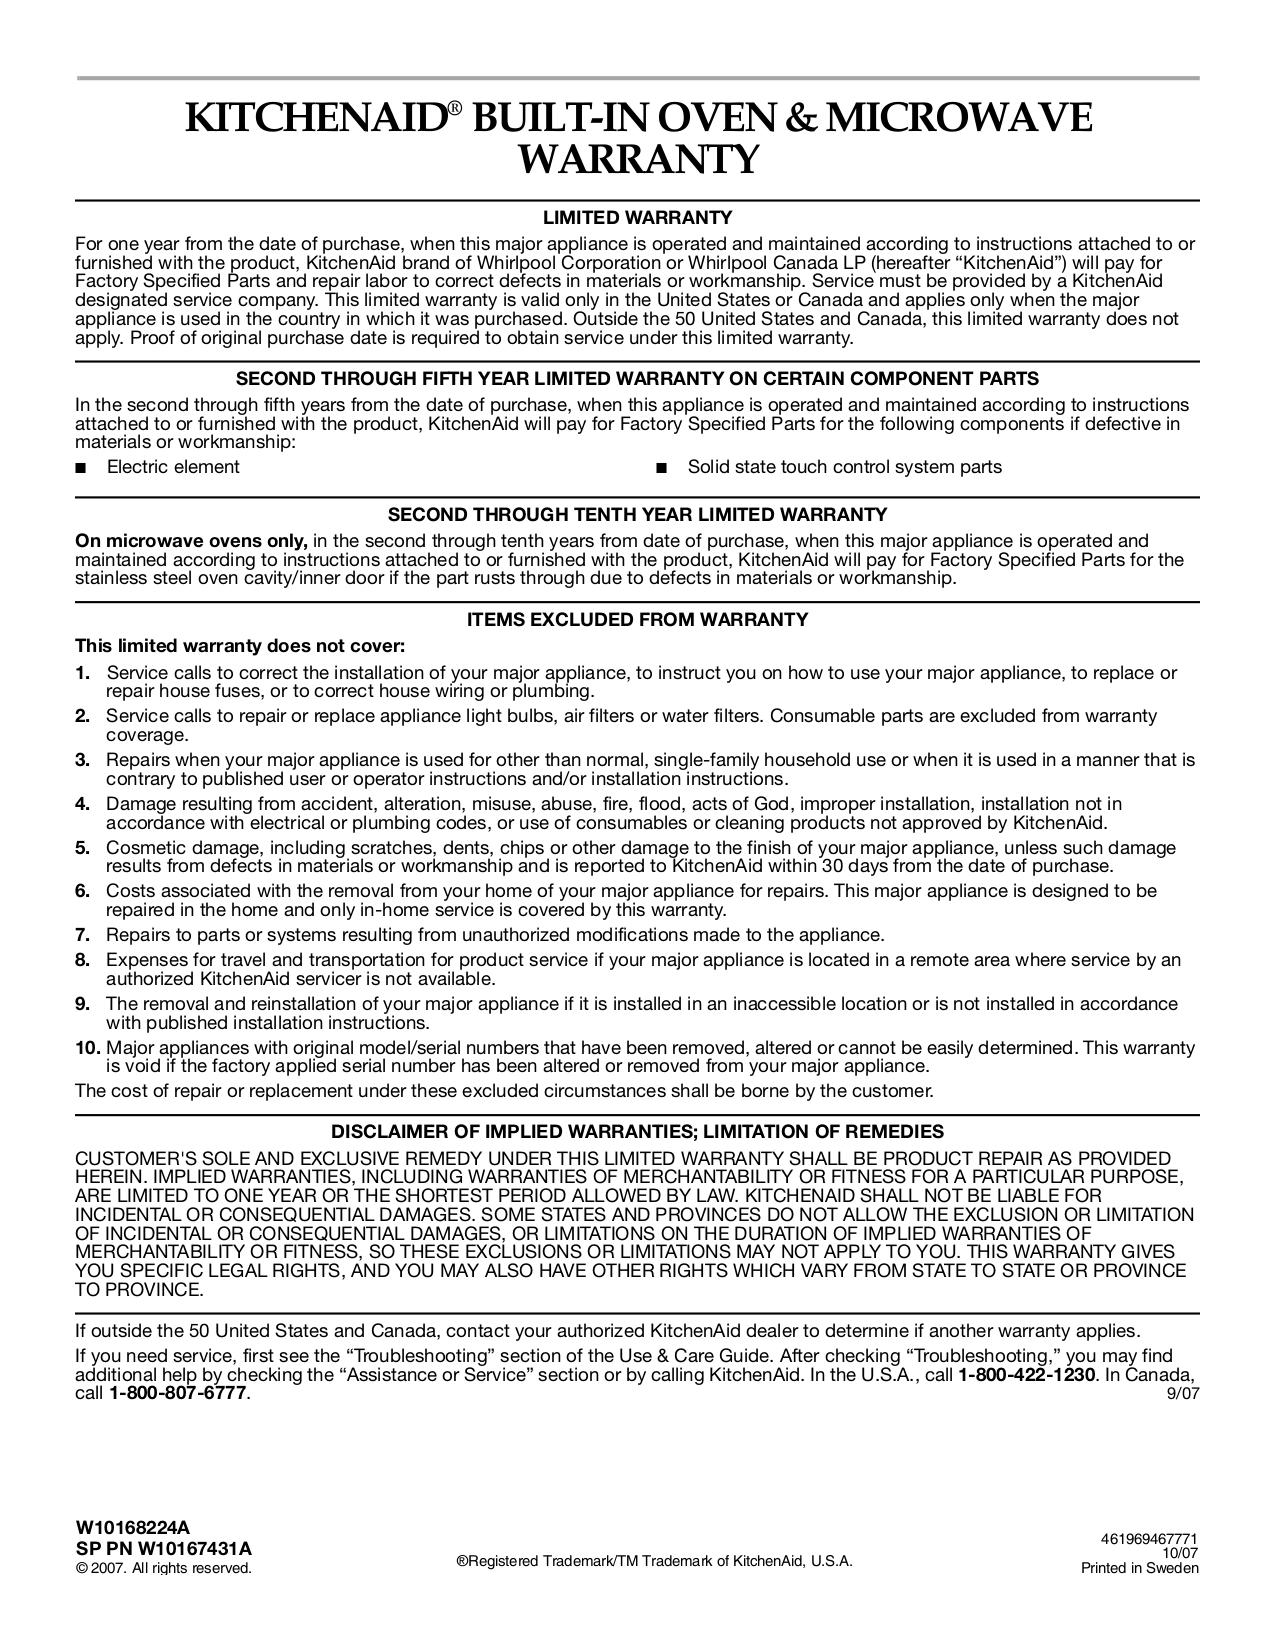 Free Pdf For Kitchenaid Kbms1454sss Microwave Manual